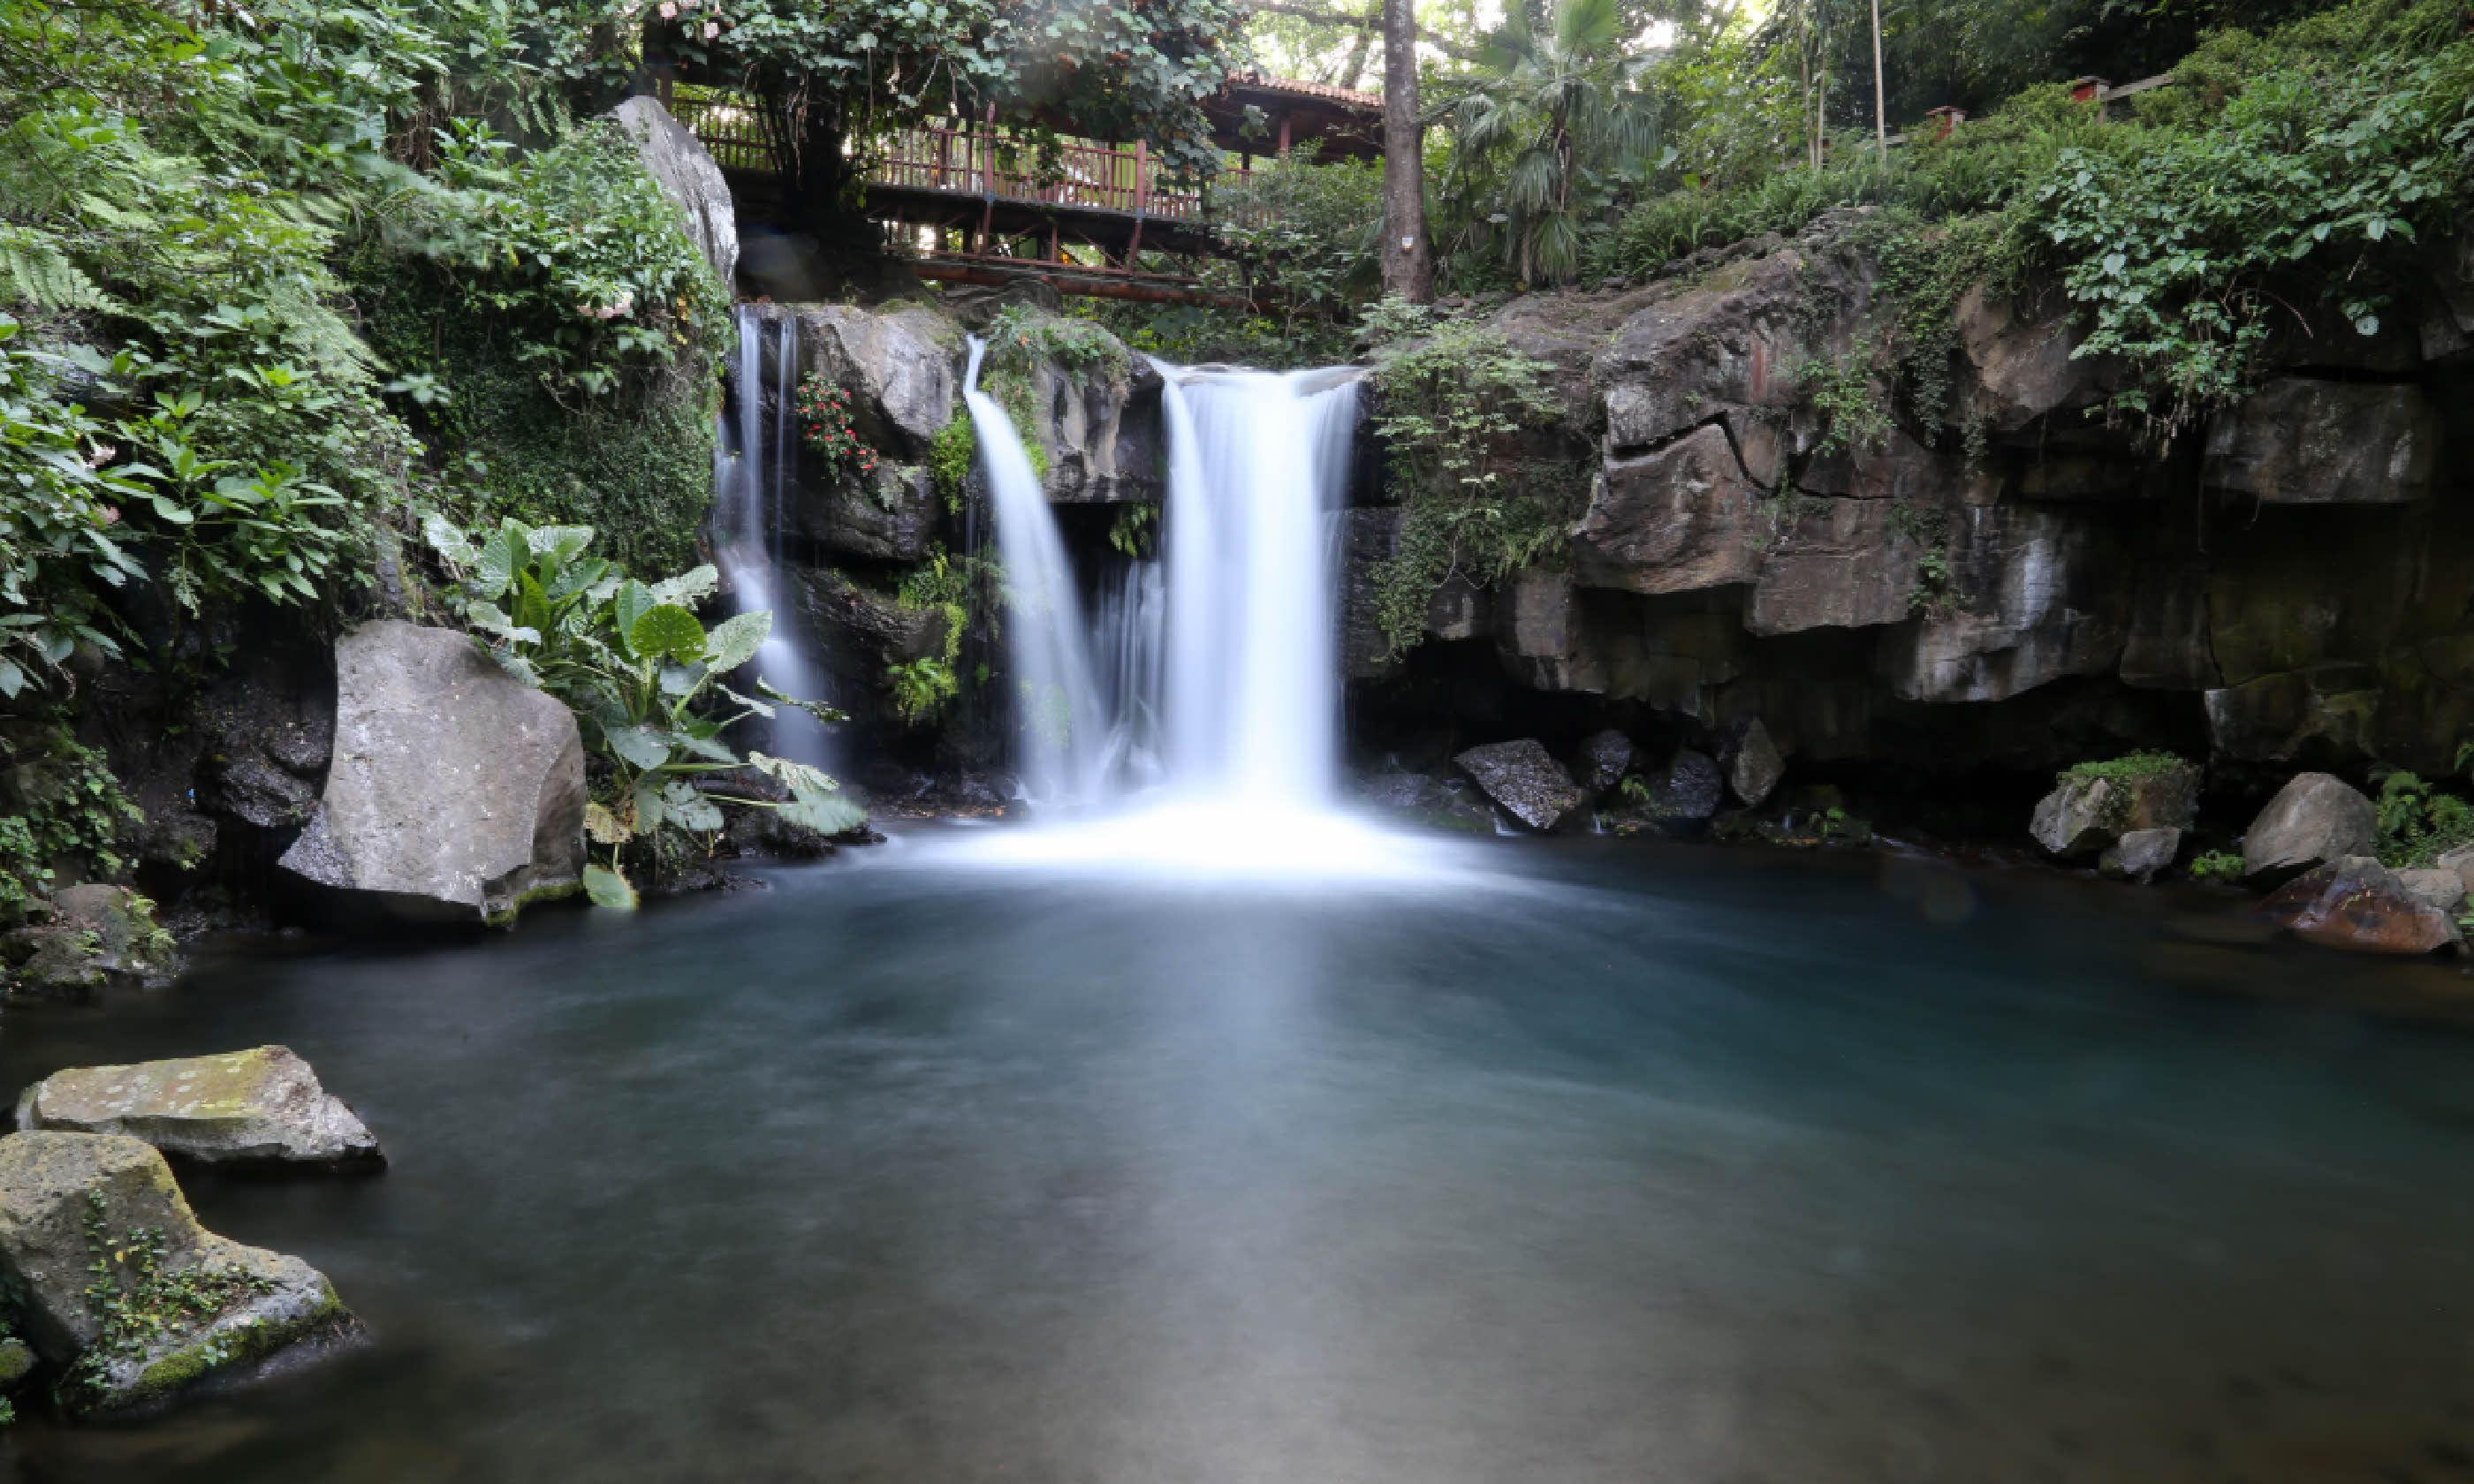 Michoacan, Mexico (Shutterstock)